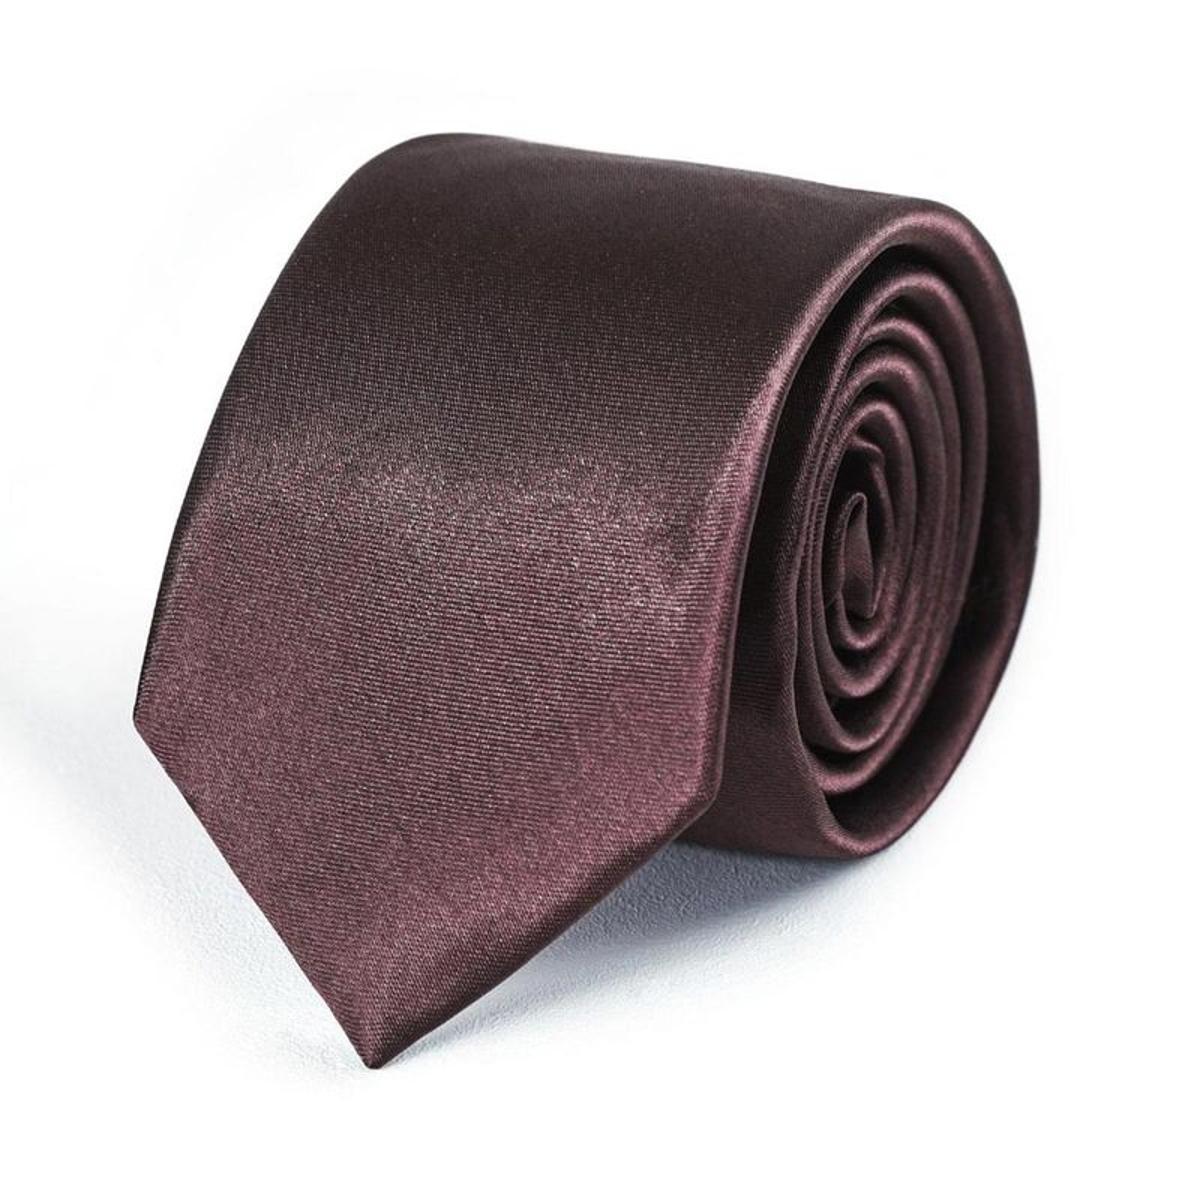 Cravate Slim unie - Fabriqué en europe